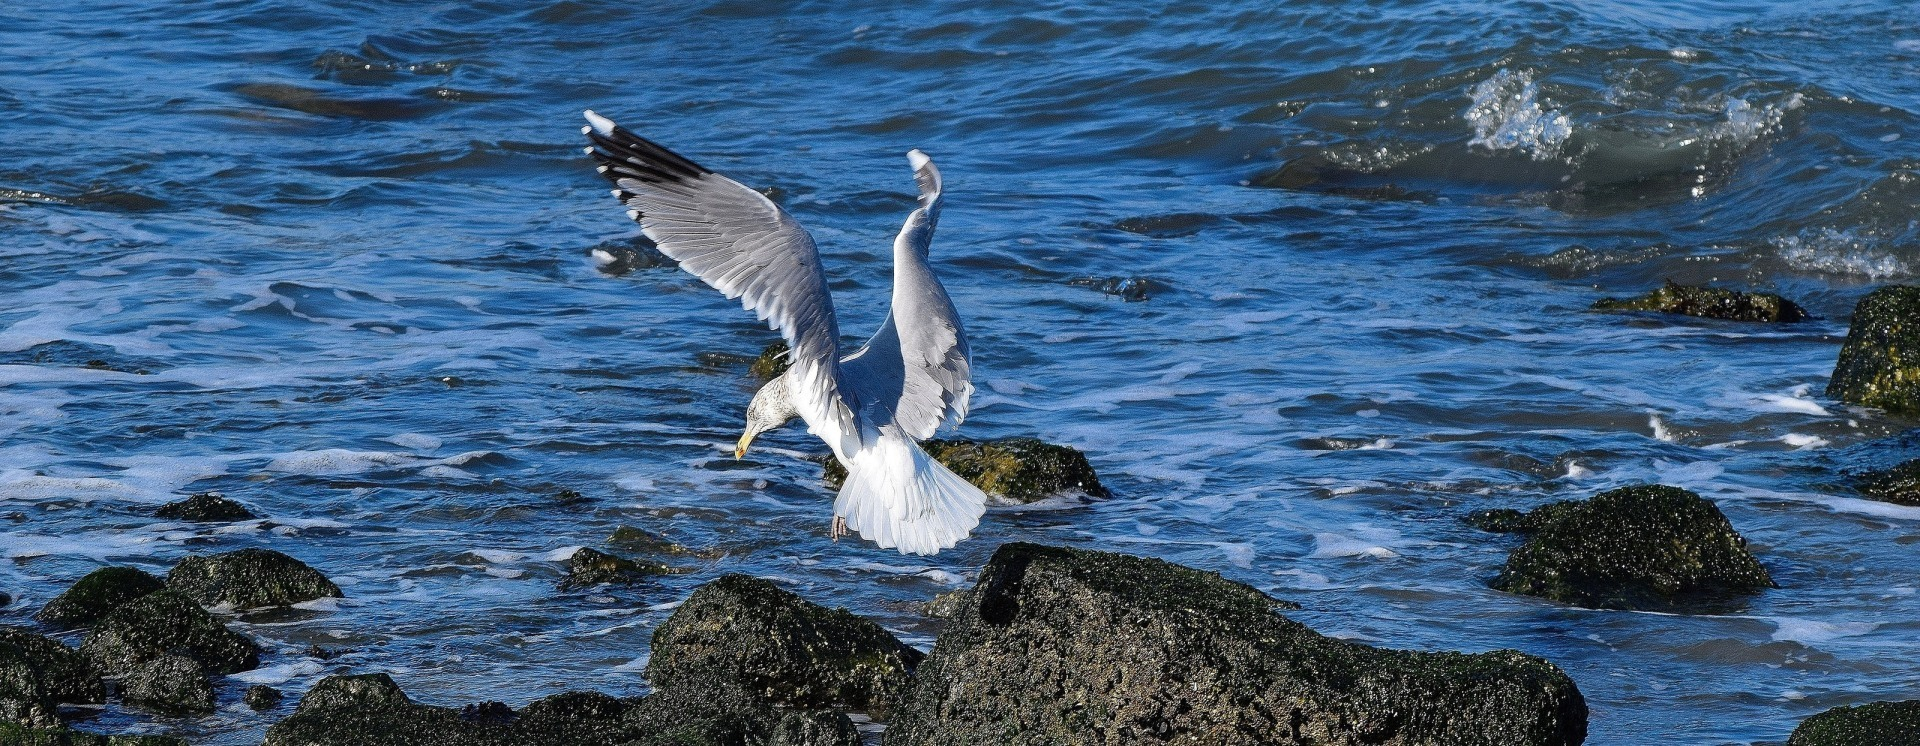 1452648207 sea gull landining copy